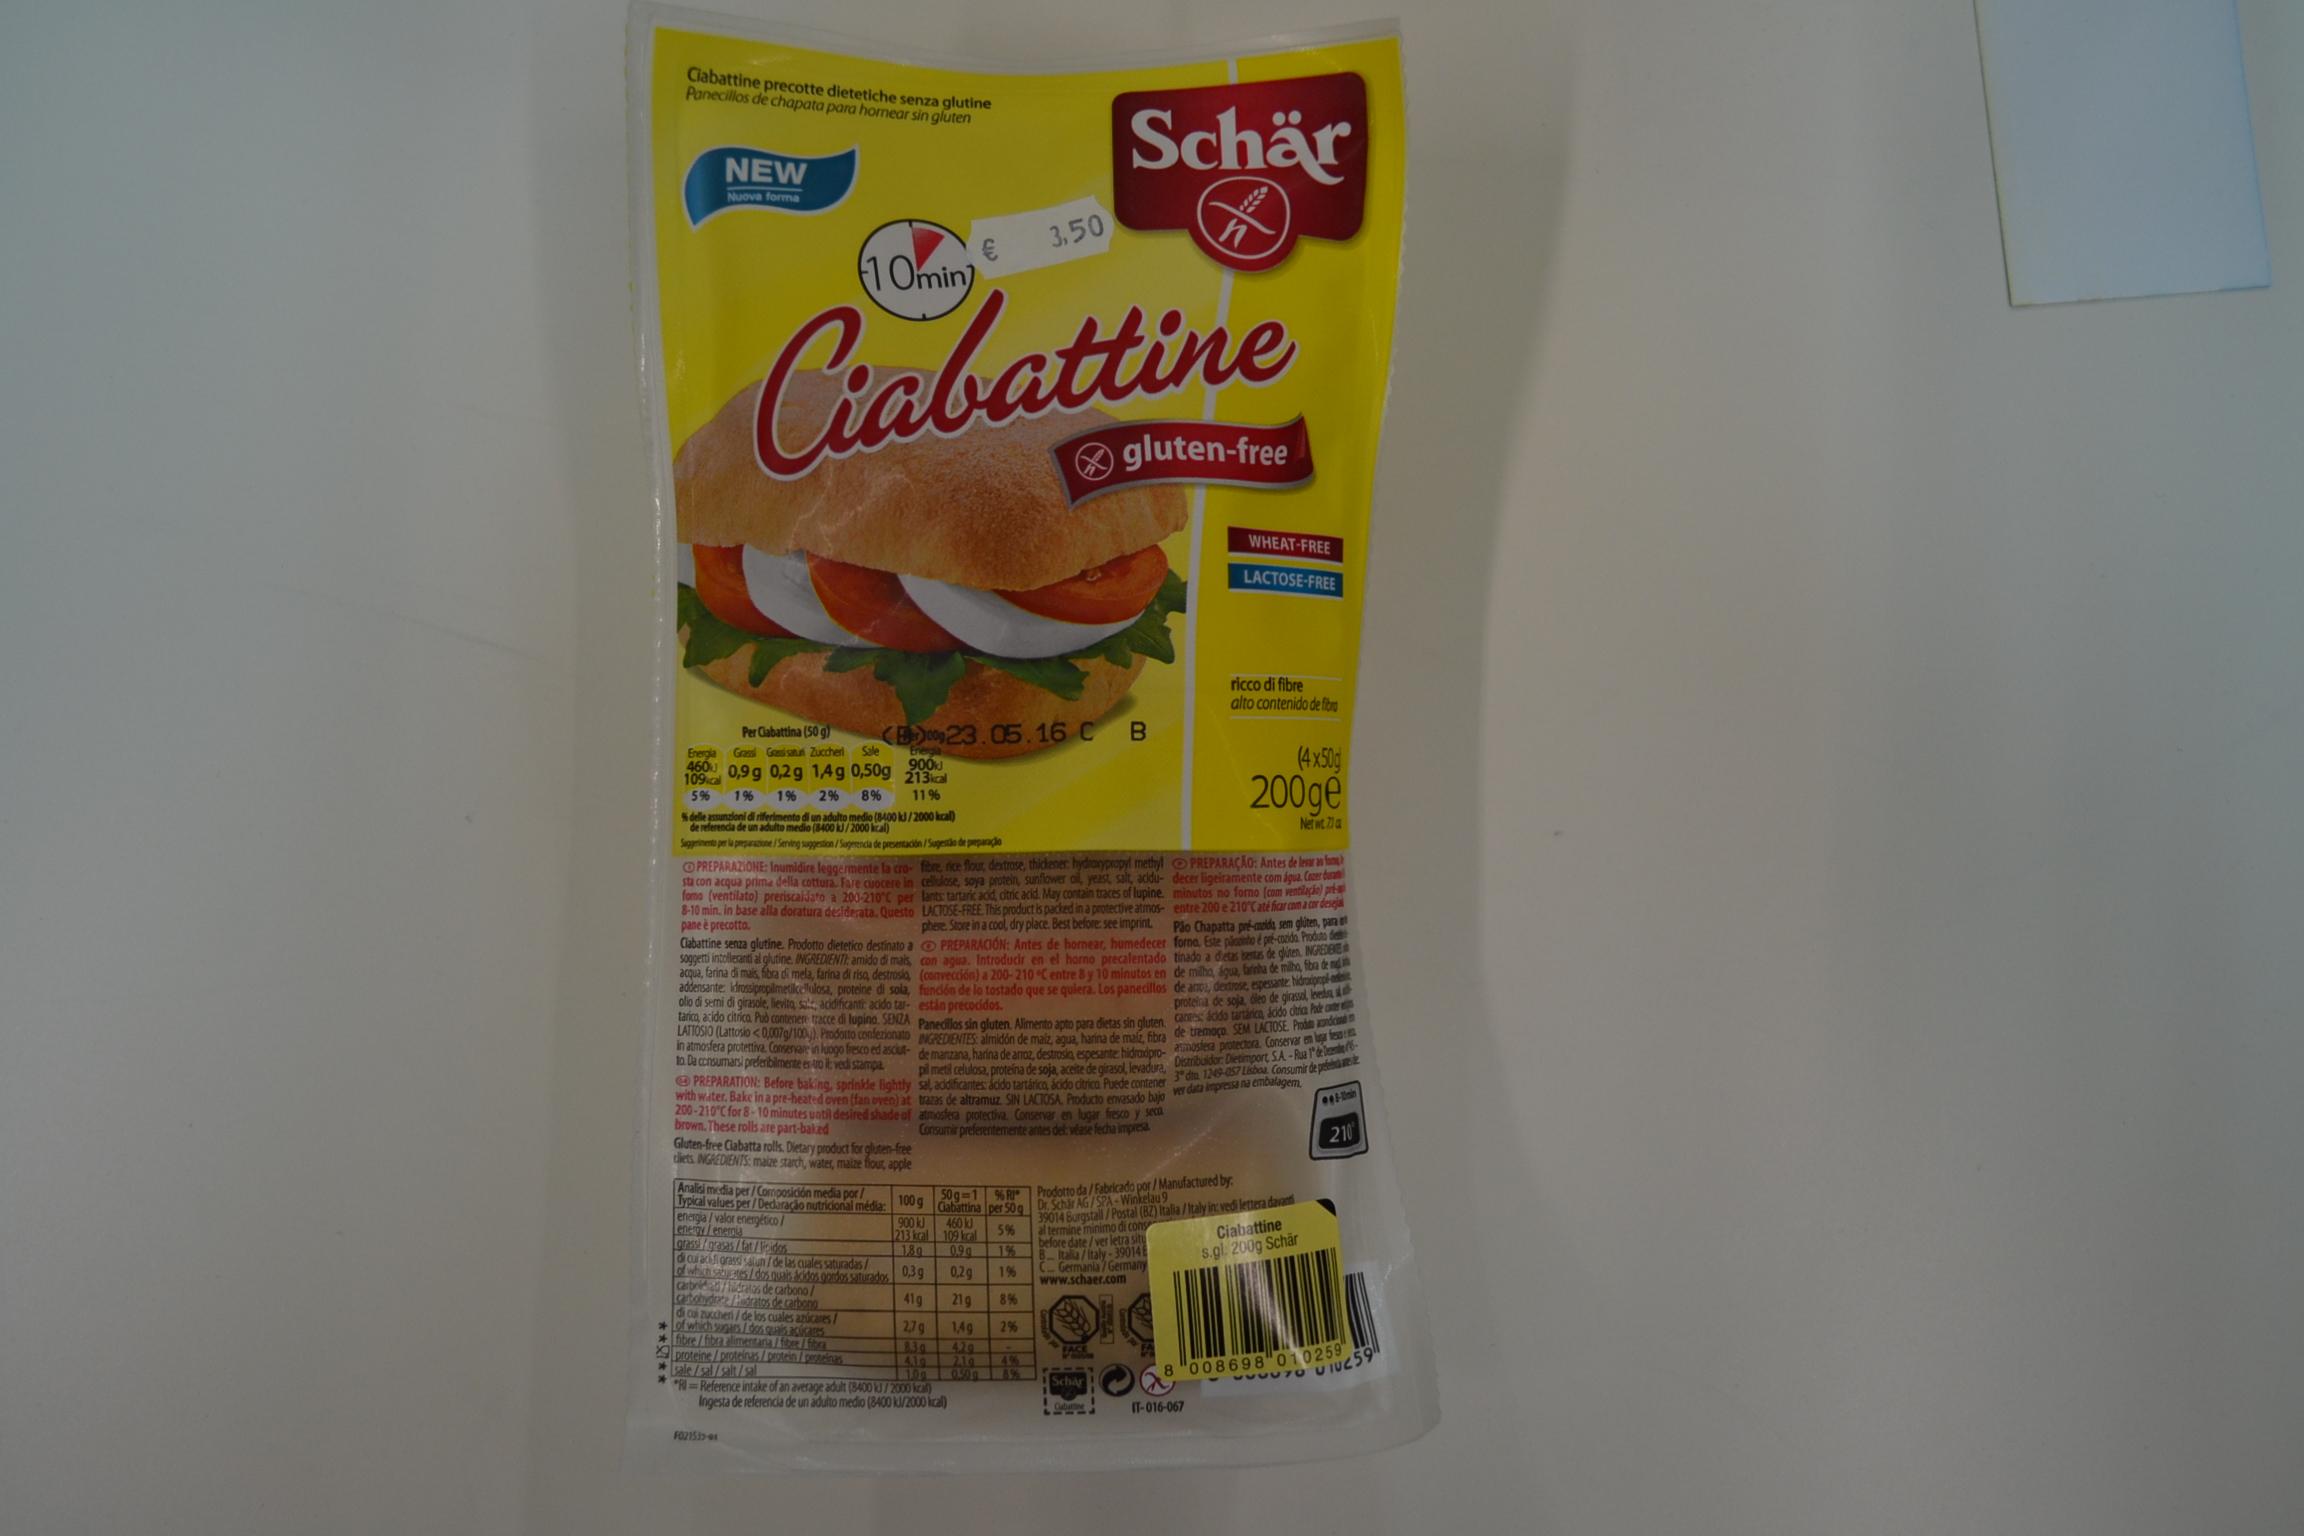 Ciabattine SCHAR € 3,50